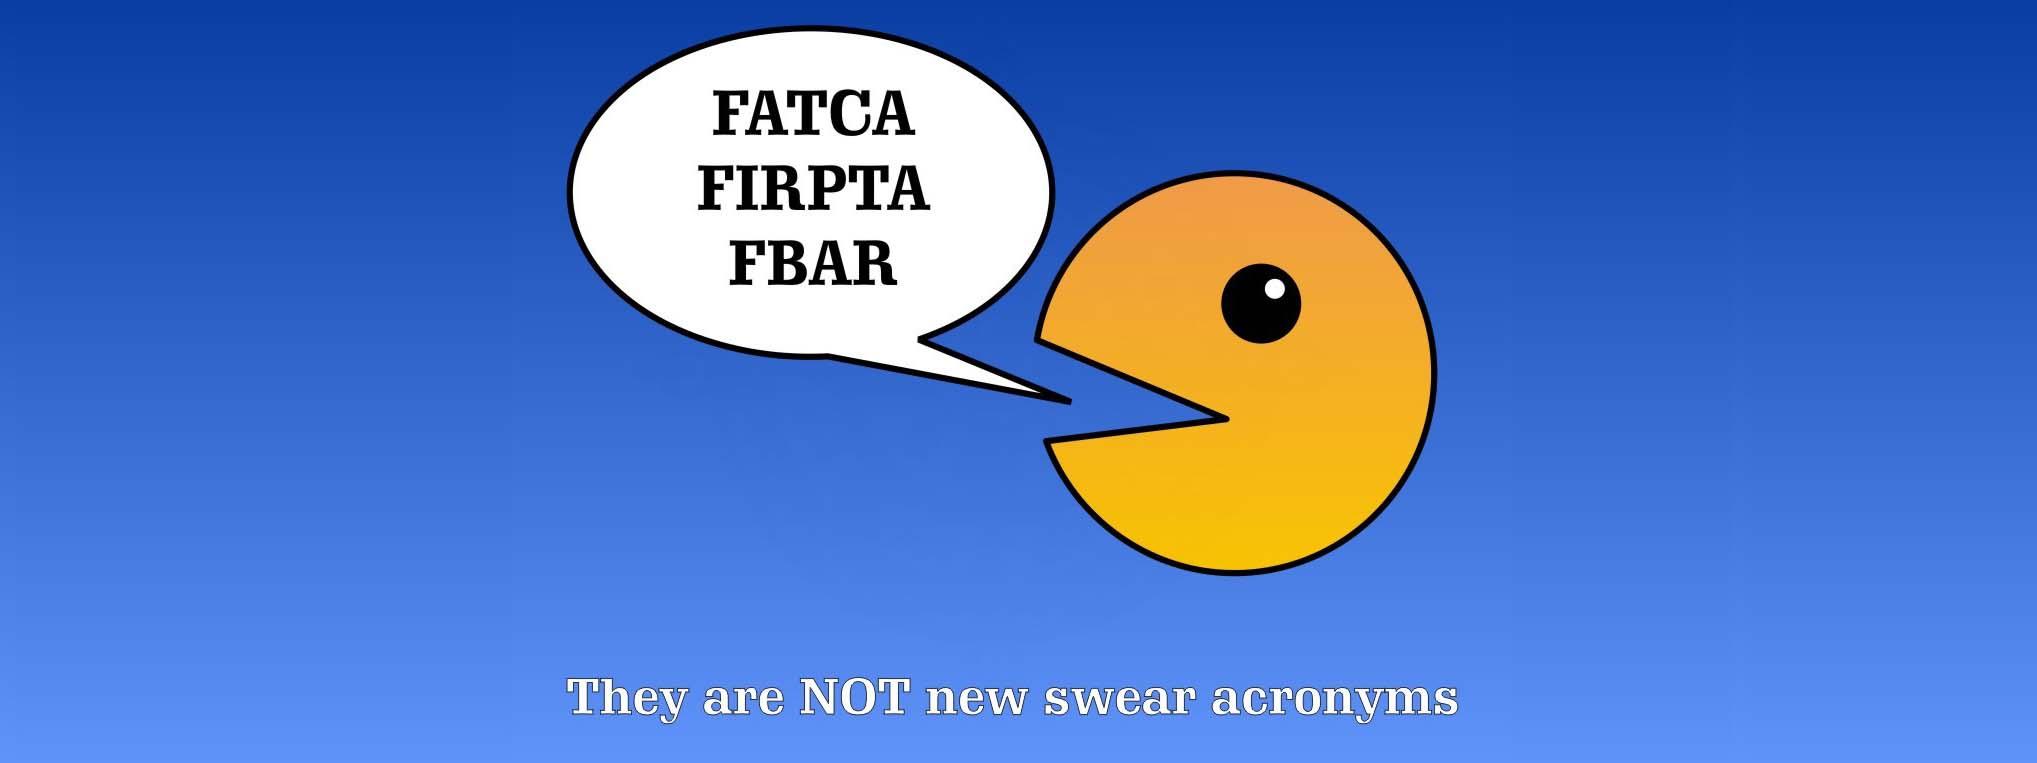 FATCA FBAR FIRPTA website slider image